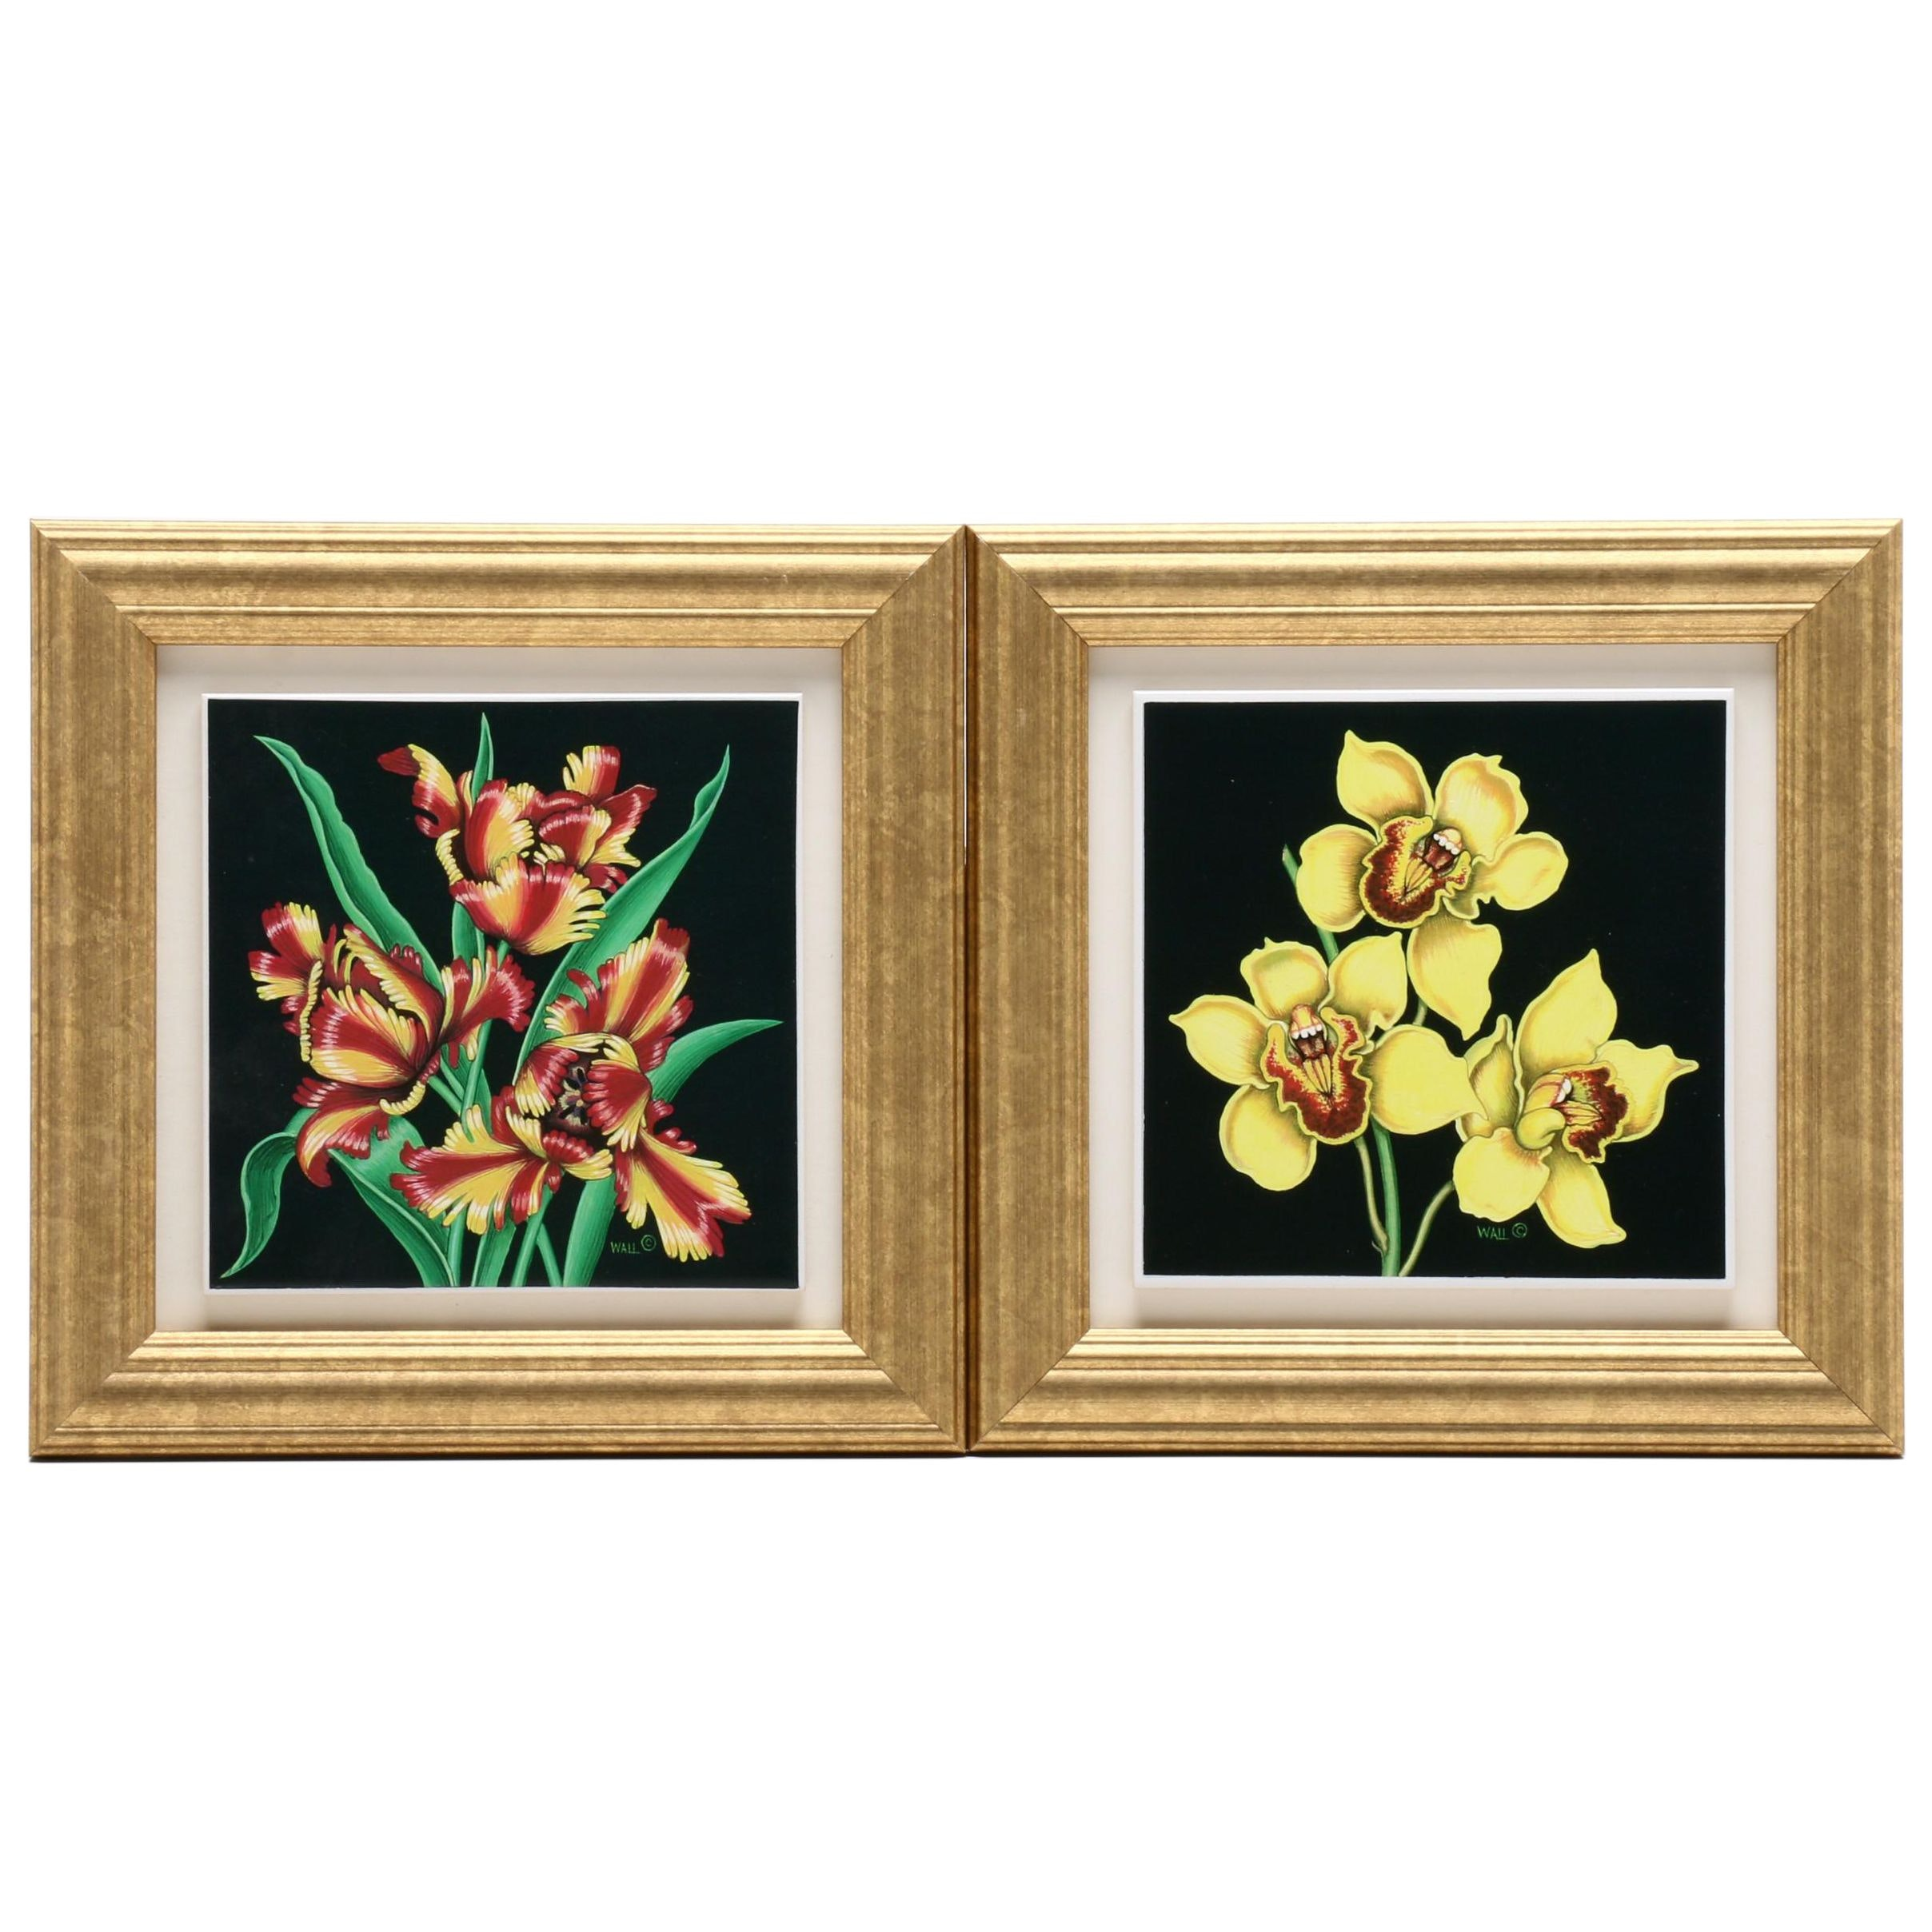 Sue Wall Studio Art Flowers on Ceramic Plaques